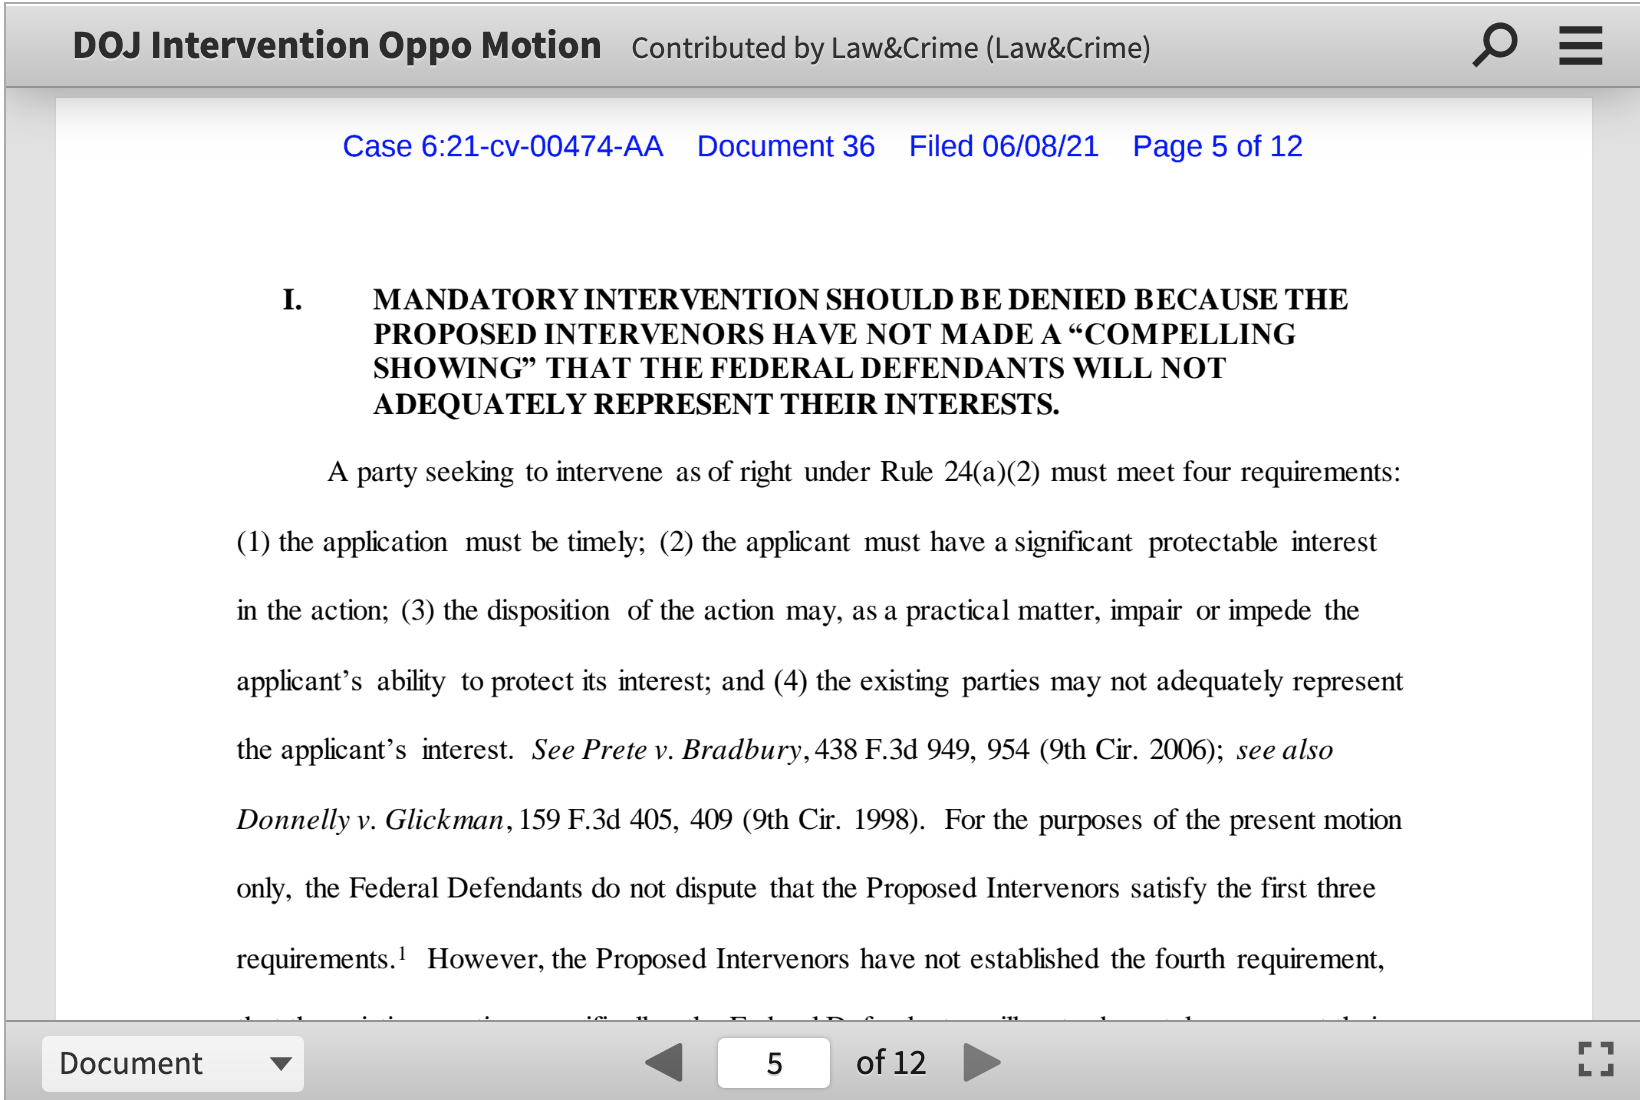 Screen-Shot-2021-06-09-at-6.31.58-PM Garland Defends Law That Lets Religious Schools Discriminate Against LGBTQ Featured Joe Biden LGBT Politics Top Stories